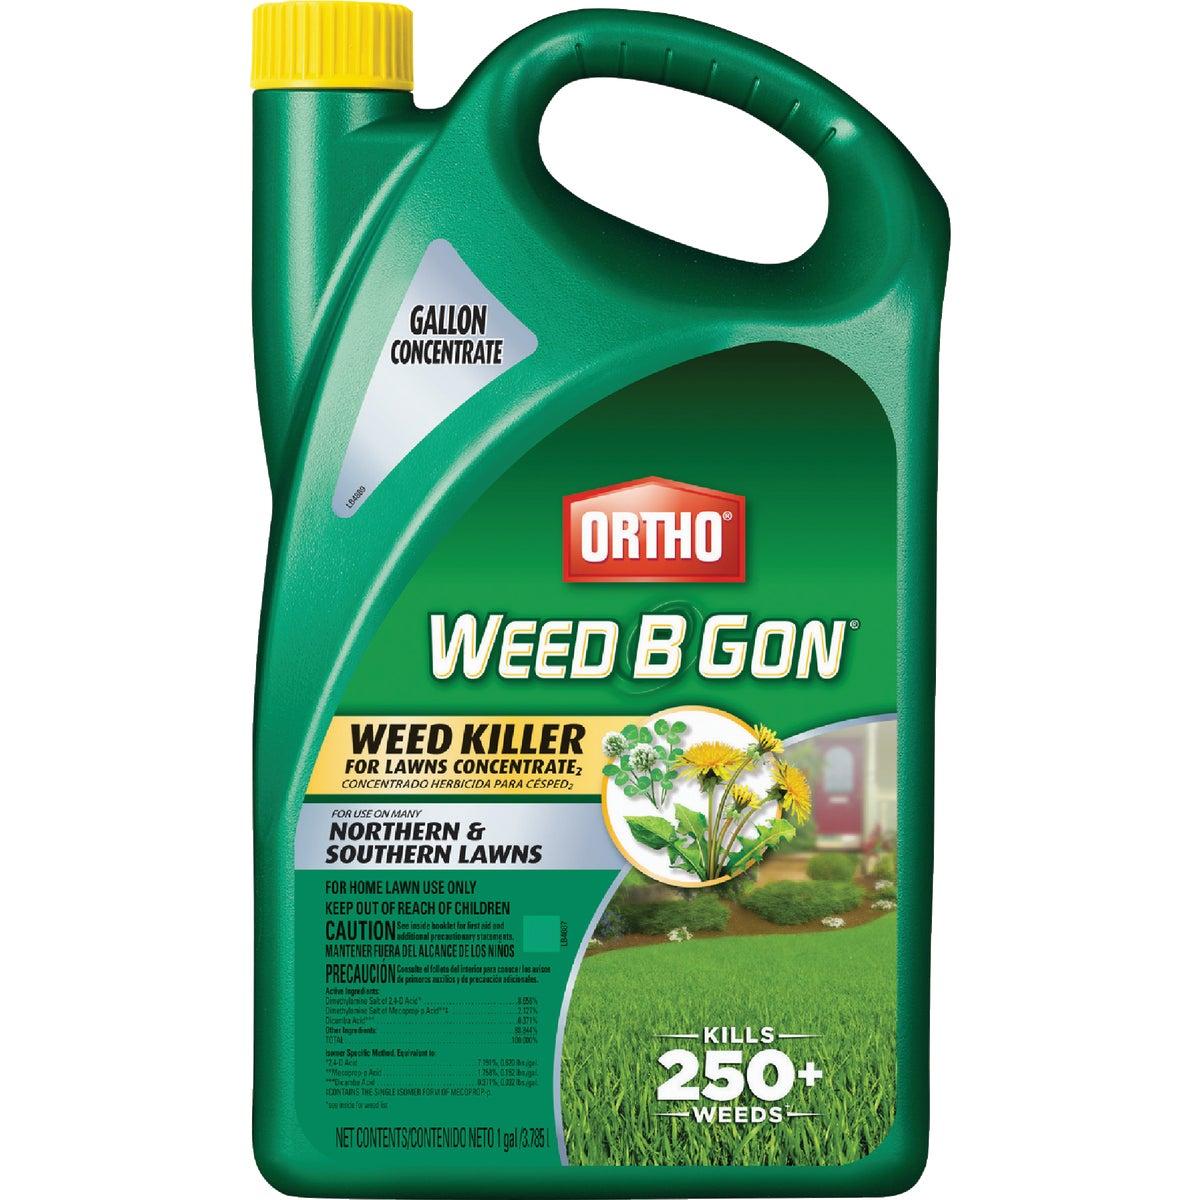 GAL CONC WEED B GON